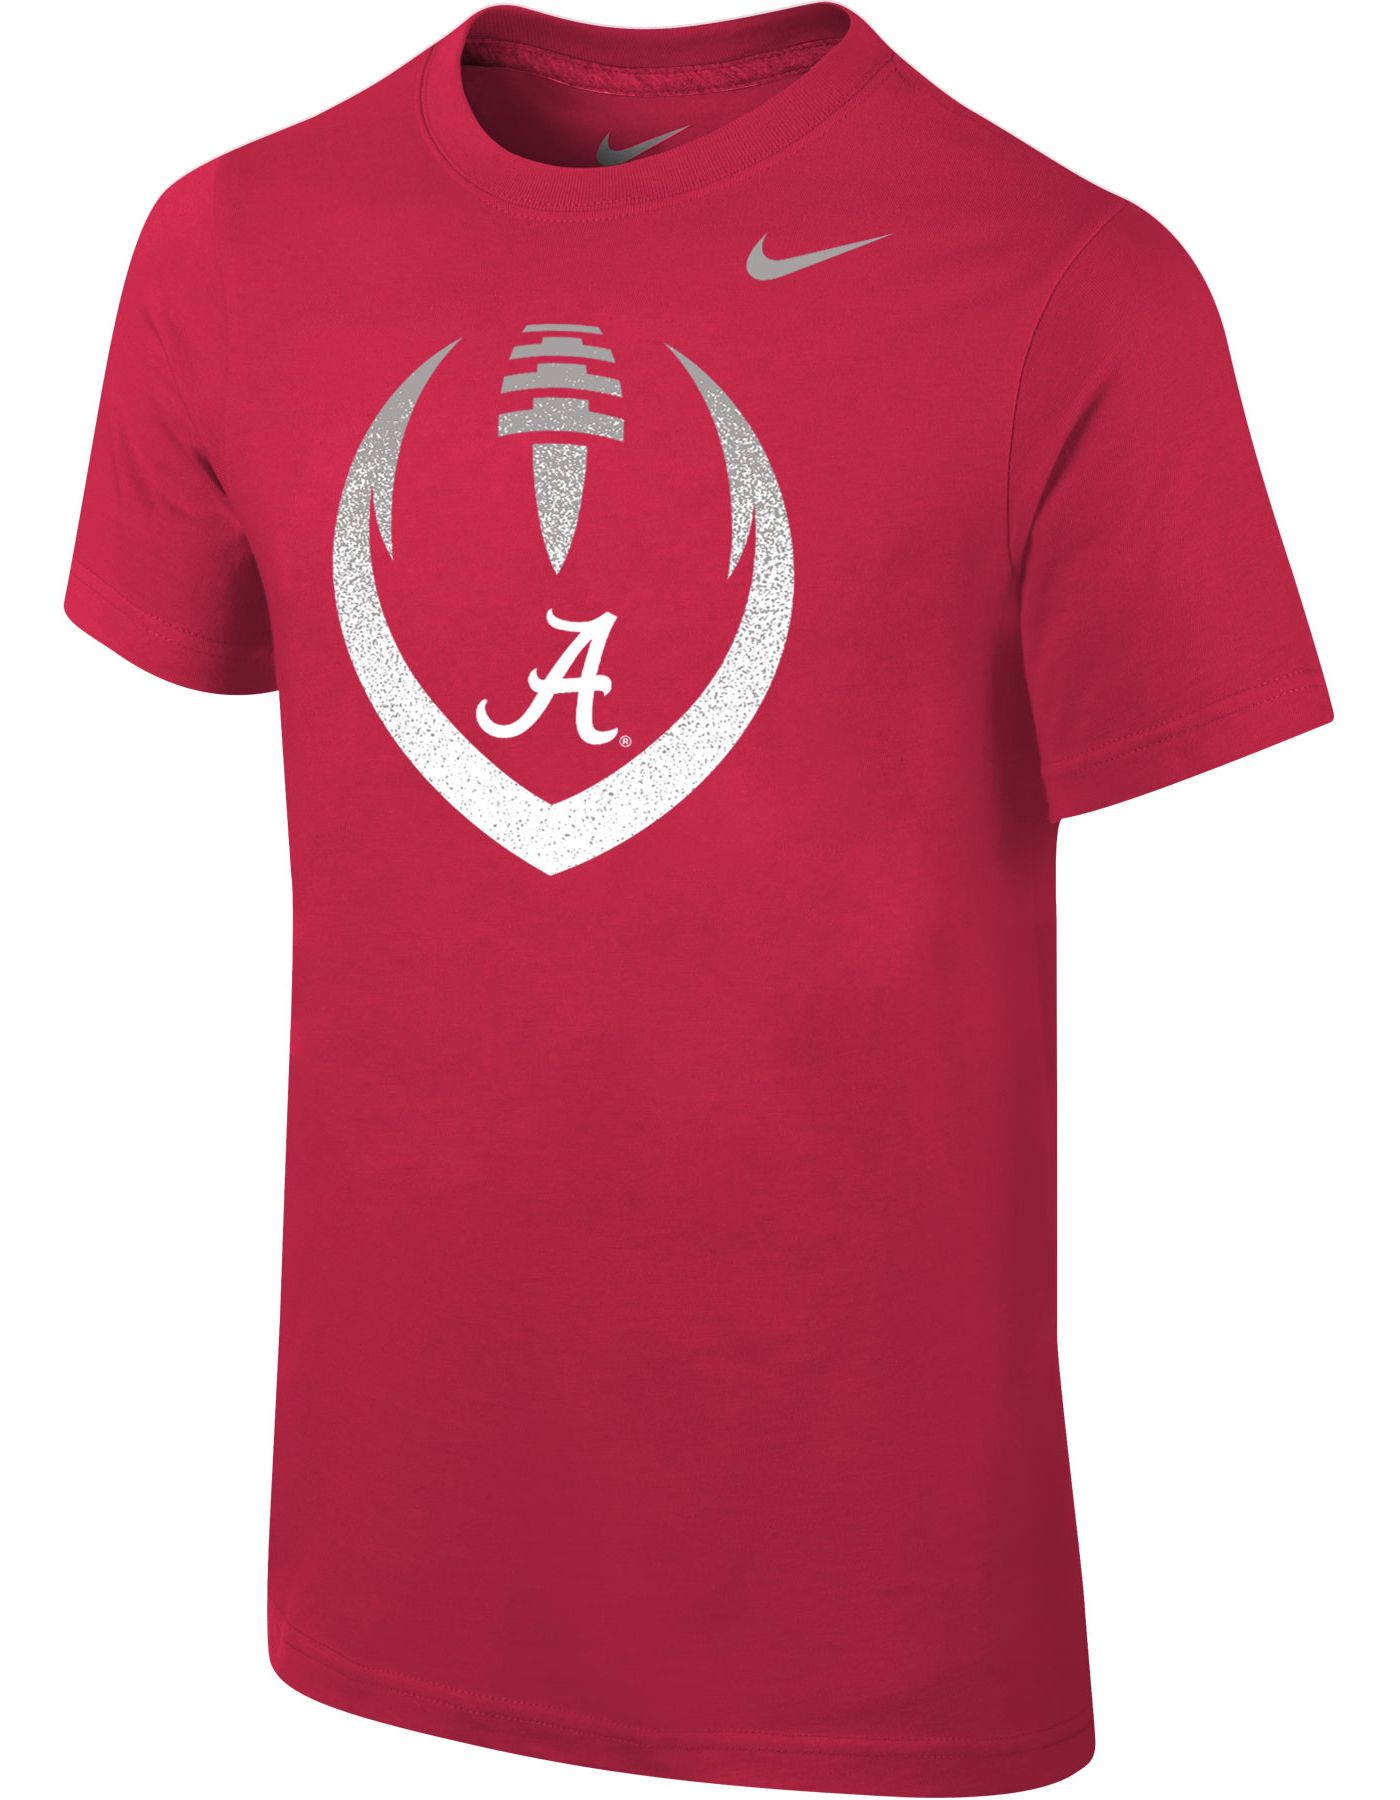 Nike Youth Alabama Crimson Tide Crimson Cotton Football Icon T-Shirt